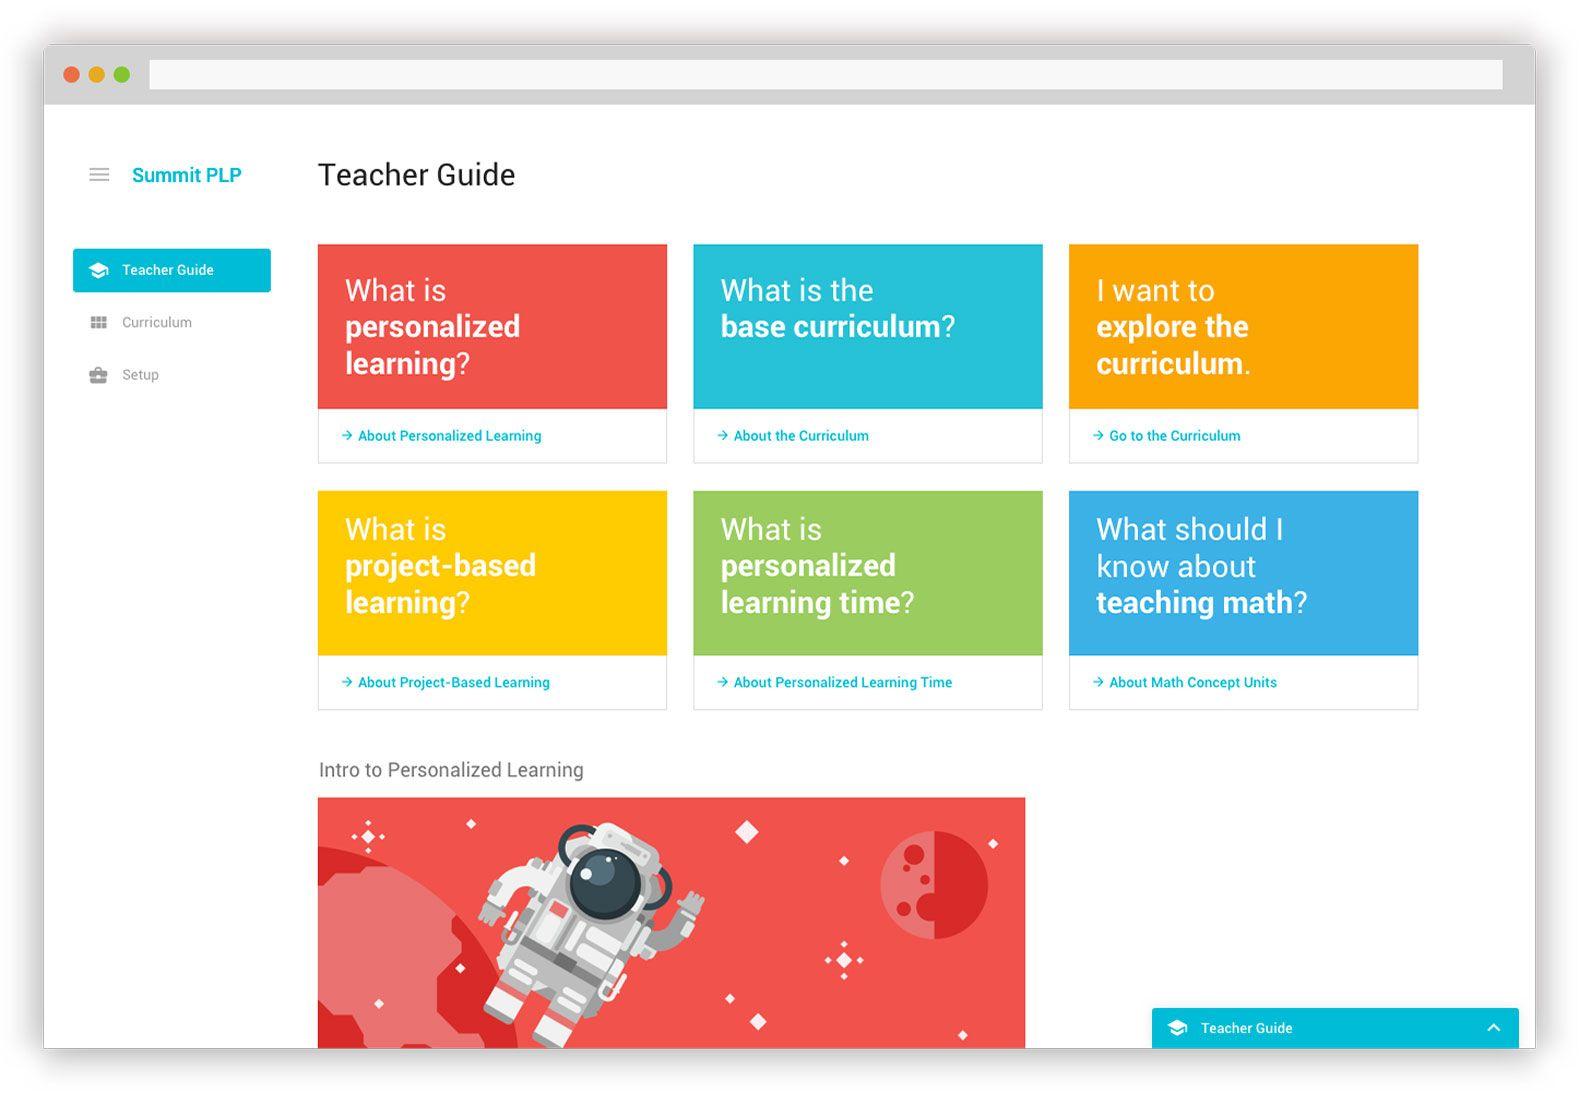 Summit's PLP Teacher Guide